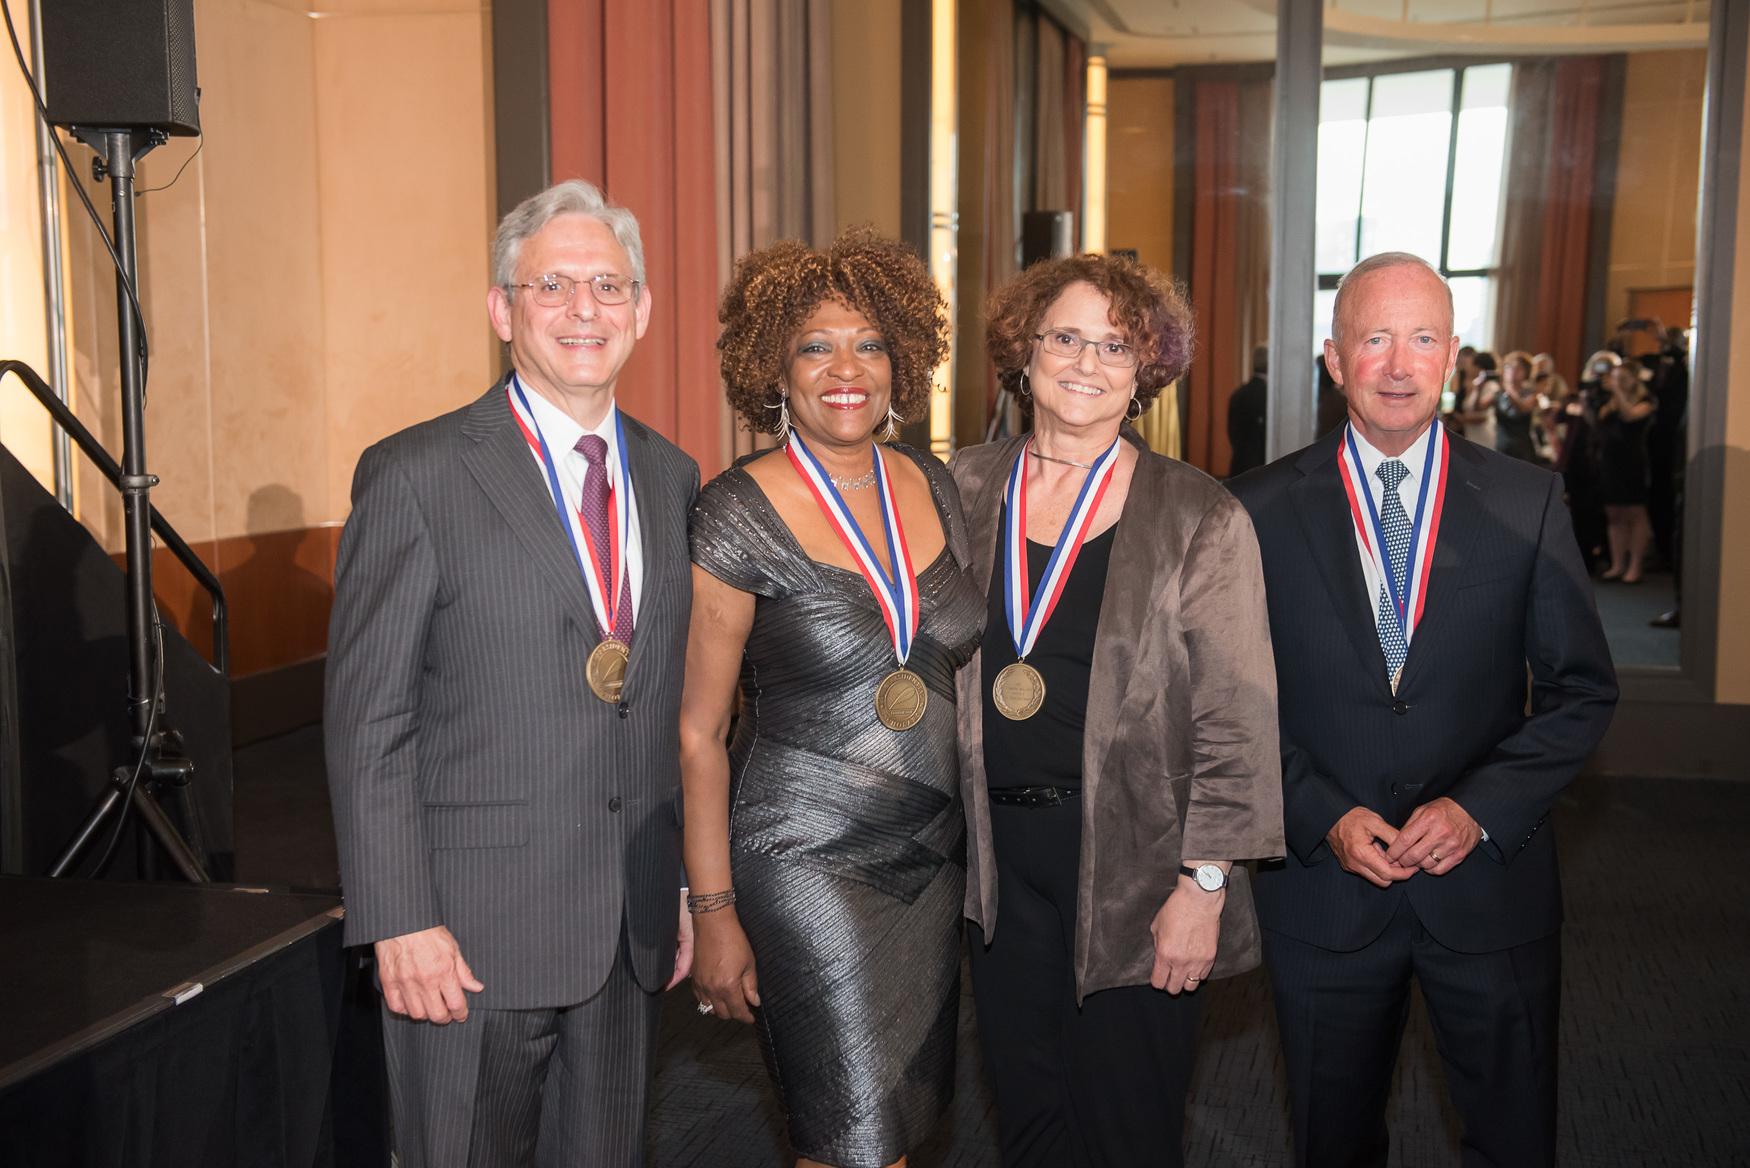 Chief Judge Merrick Garland, Rita Dove, Dr. Felice Kaufmann and Mitchell E. Daniels, Jr.